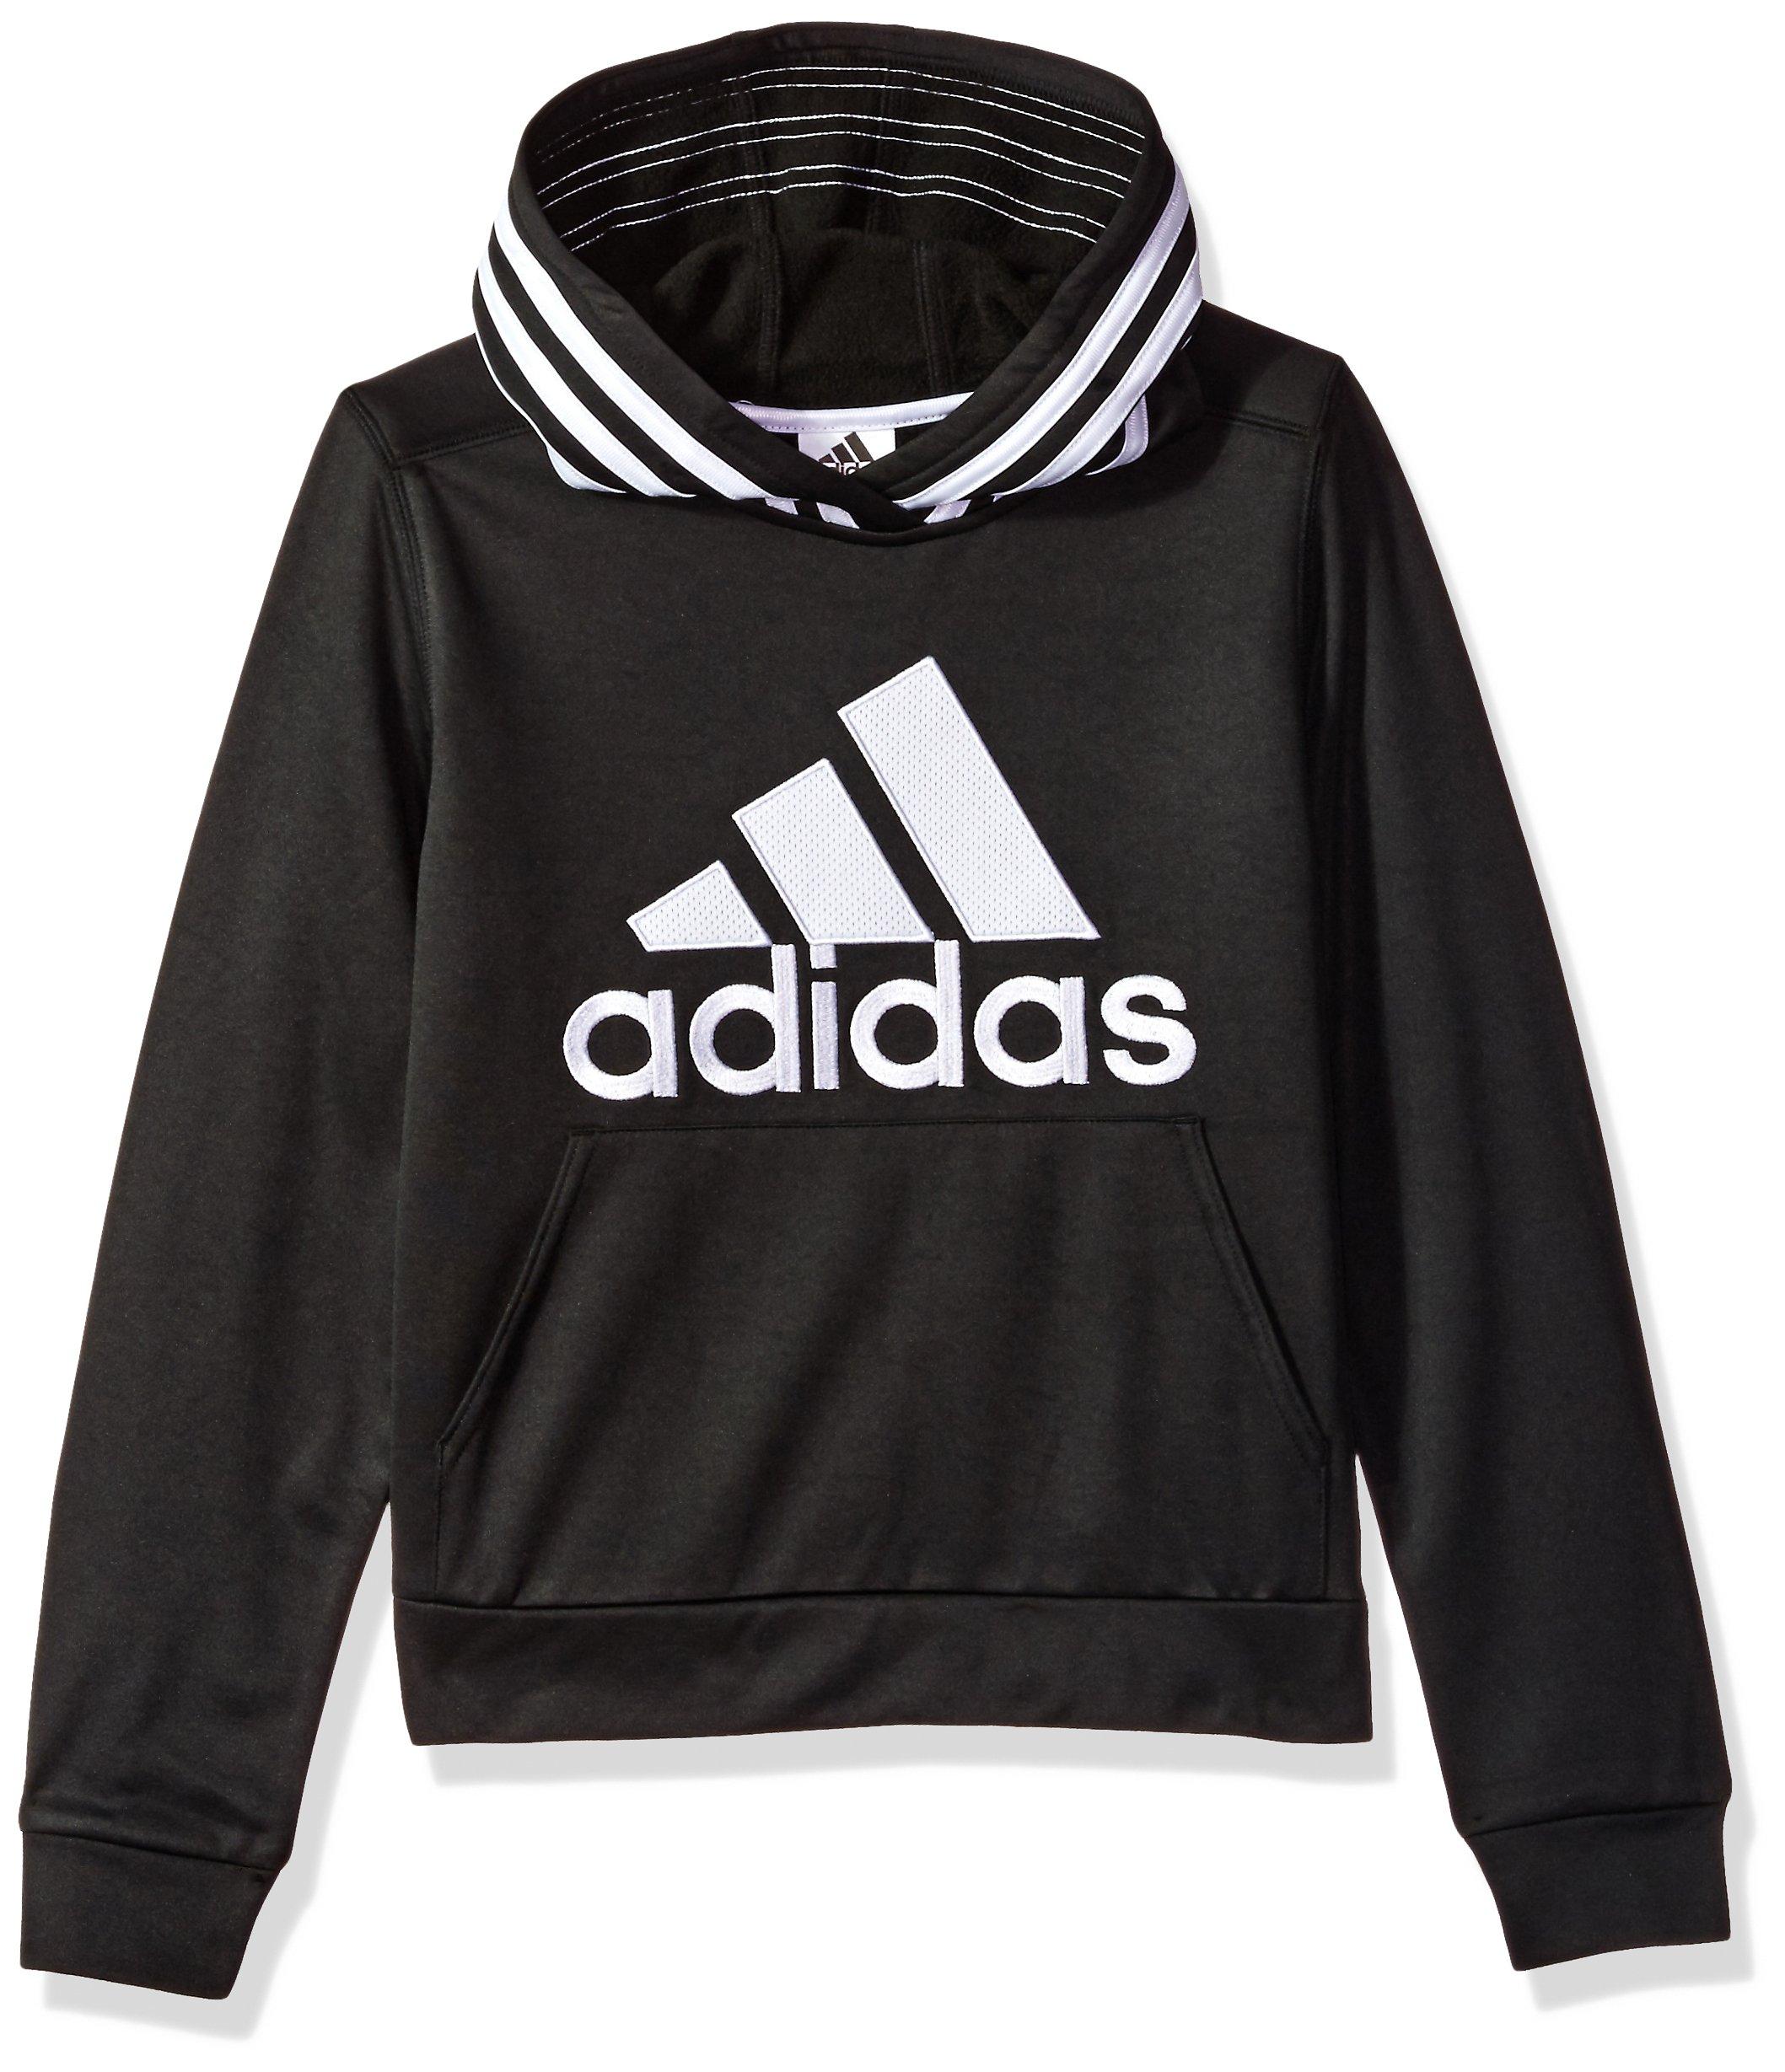 adidas Boys' Athletic Pullover Hoodie, Black, XL(18/20)